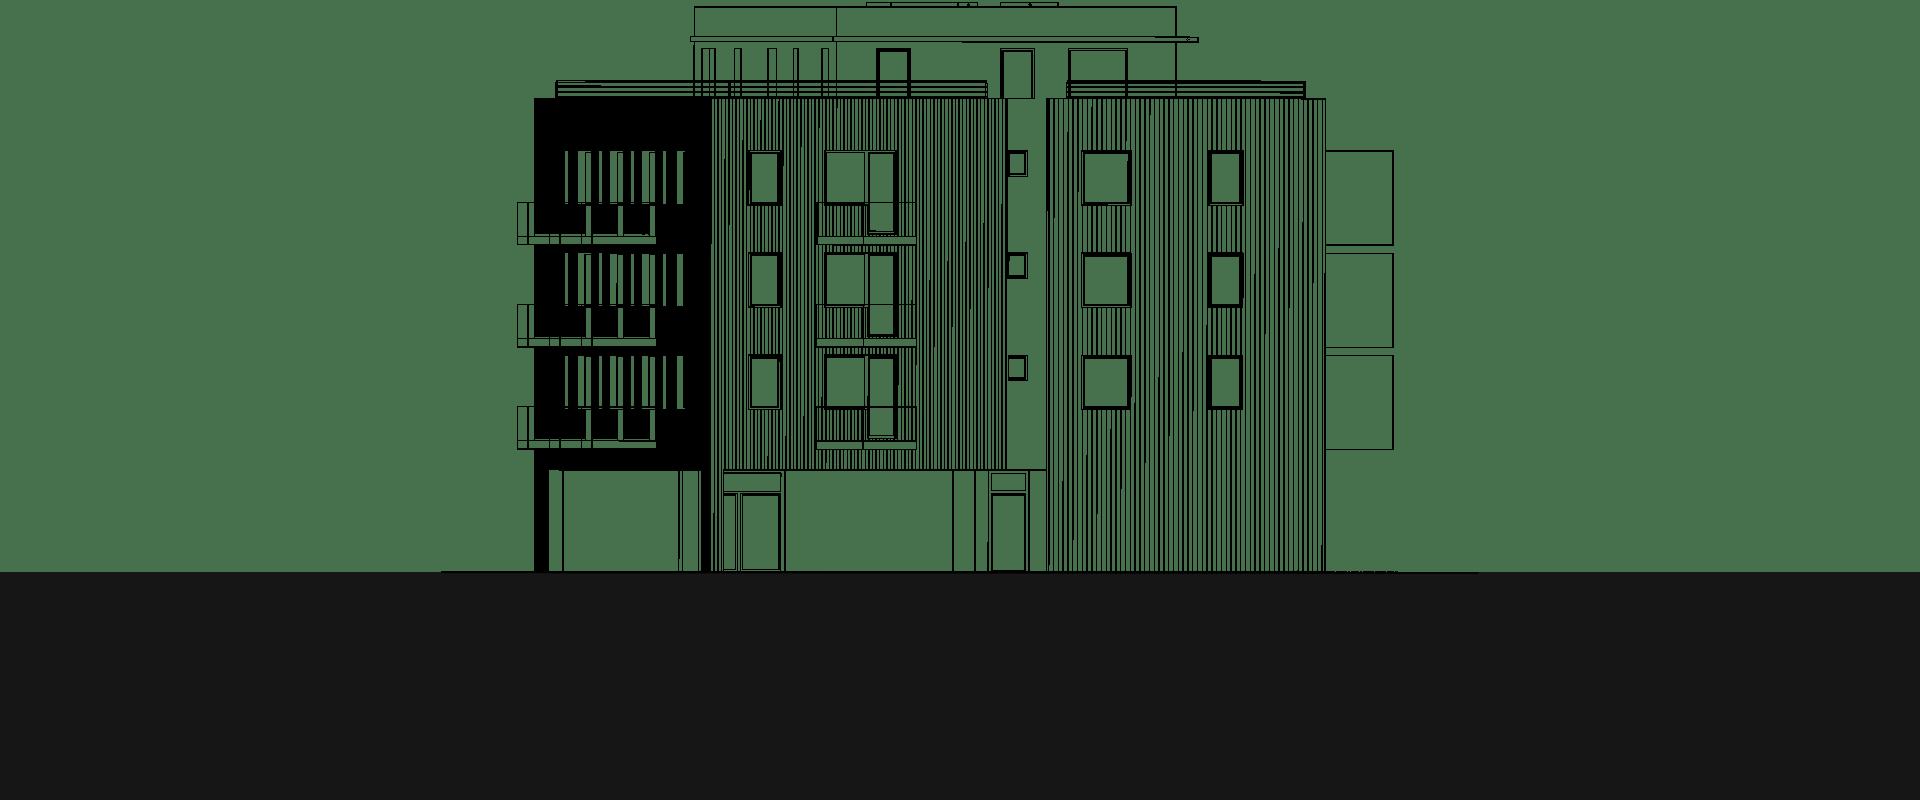 Hloubetin-drawing-8-1